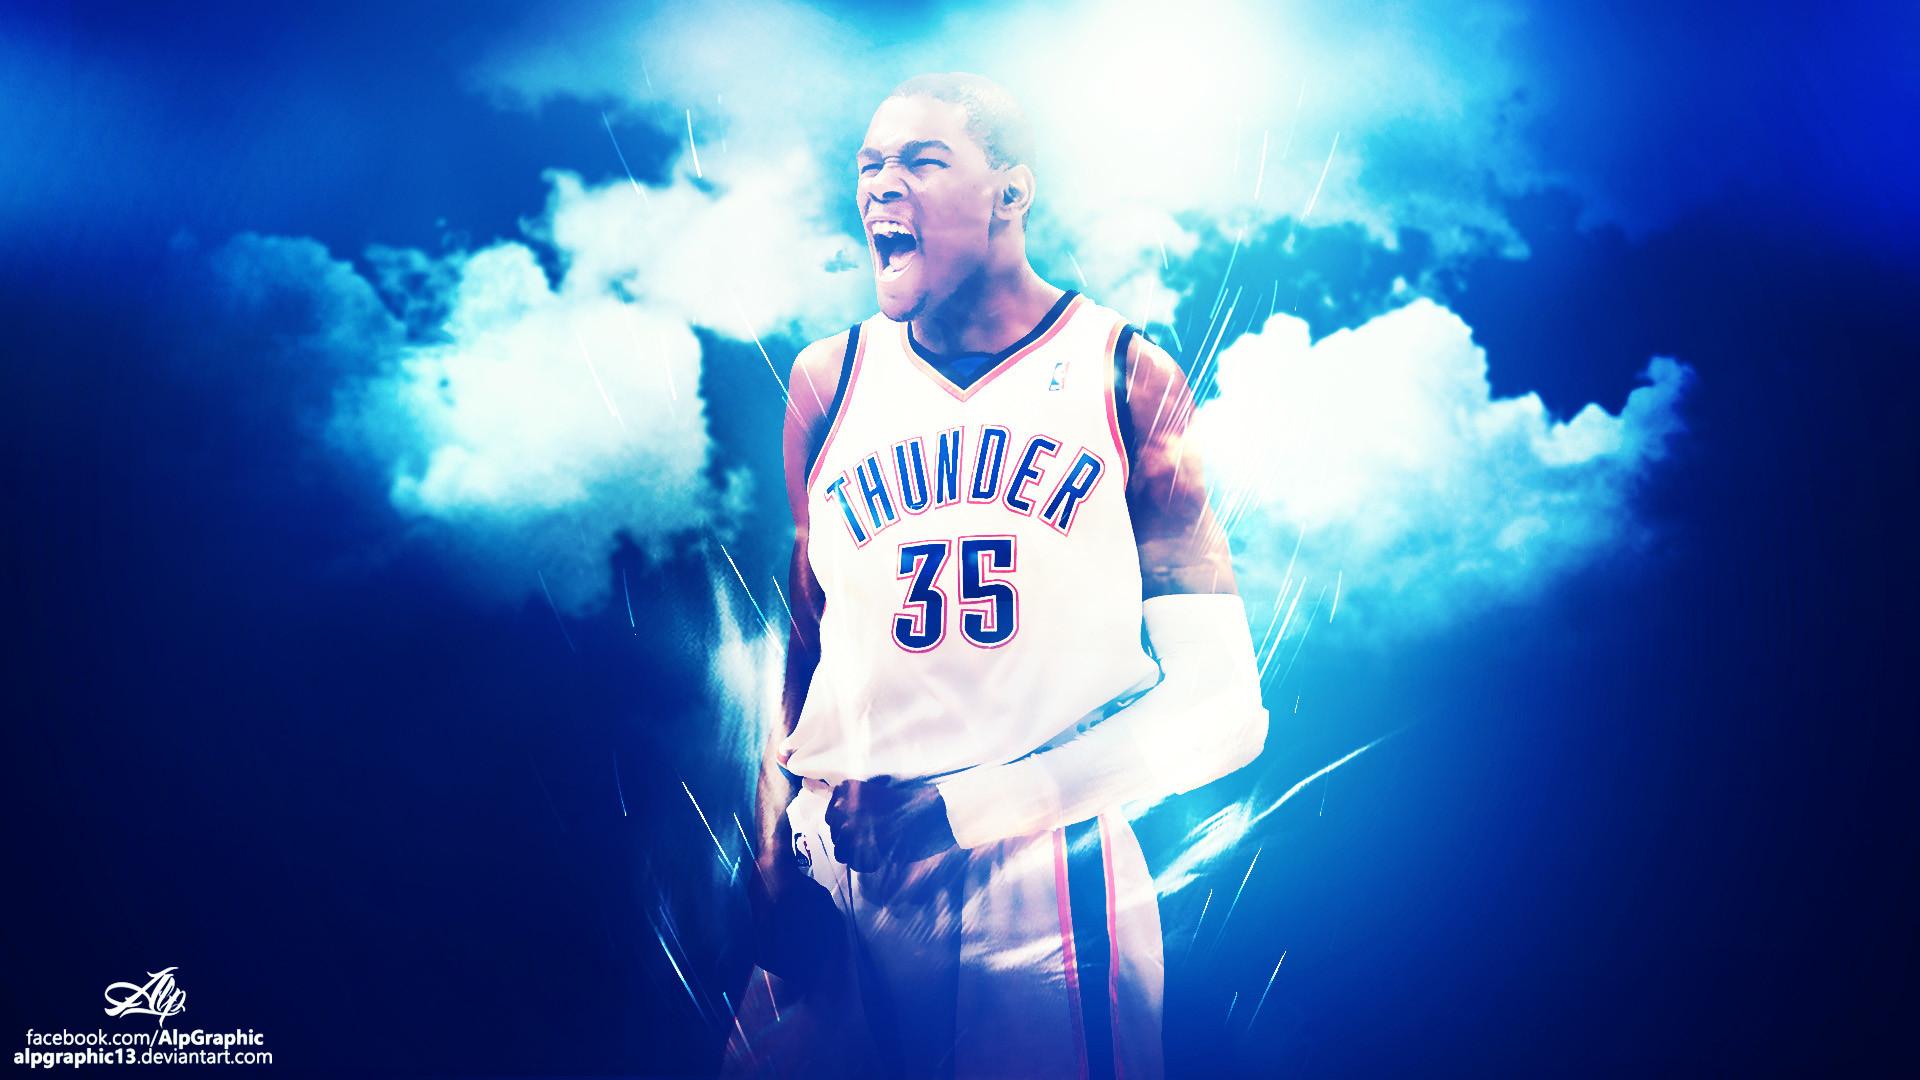 Kevin Durant Wallpapers  Basketball Wallpapers at